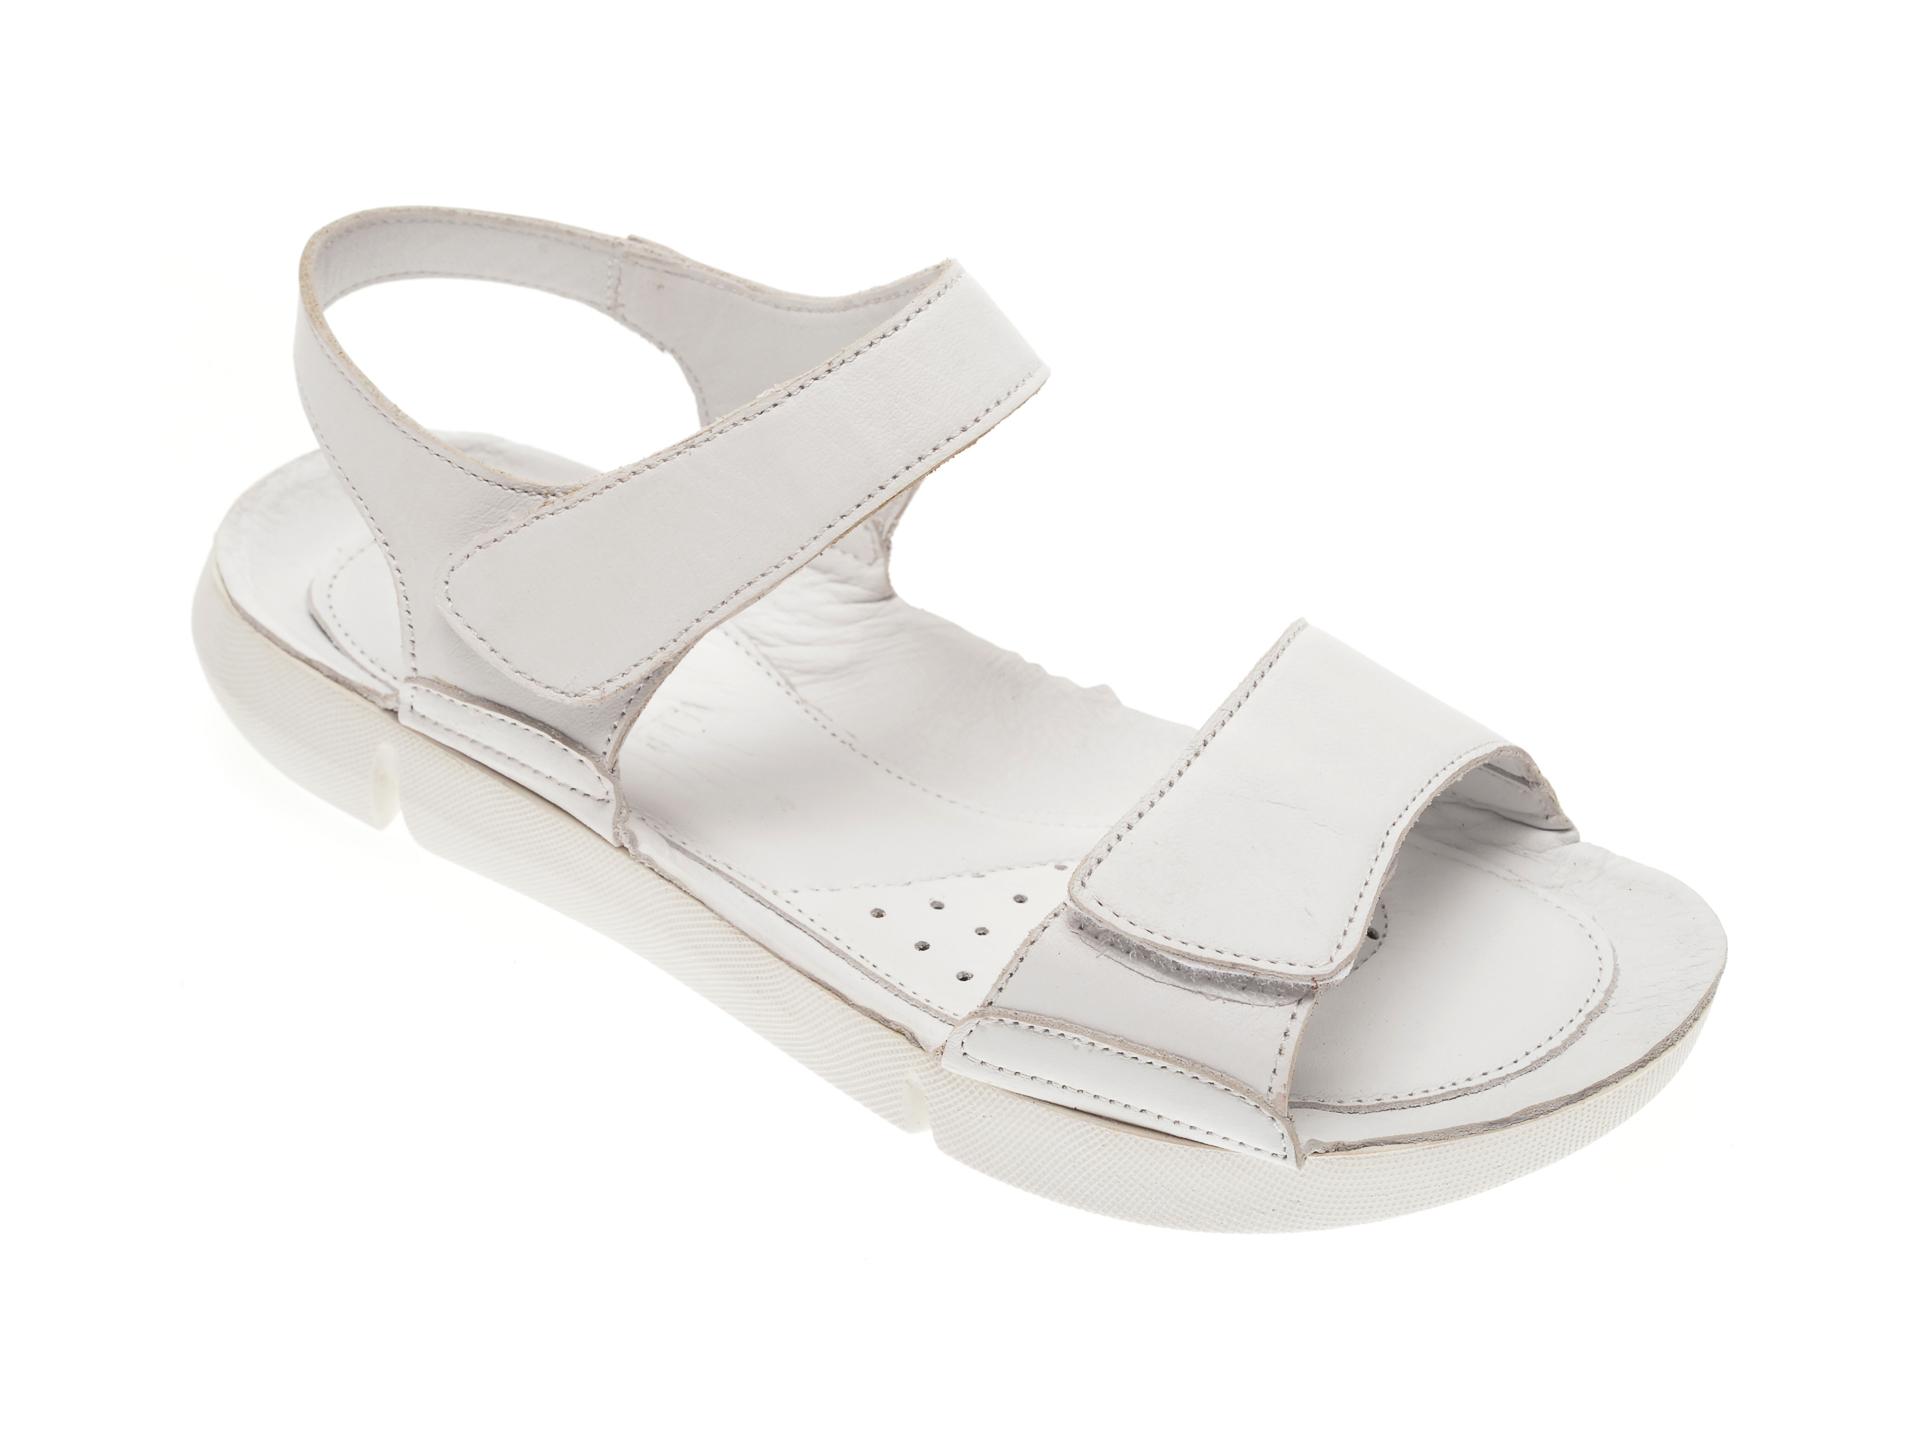 Sandale NICOLE albe, 6004, din piele naturala